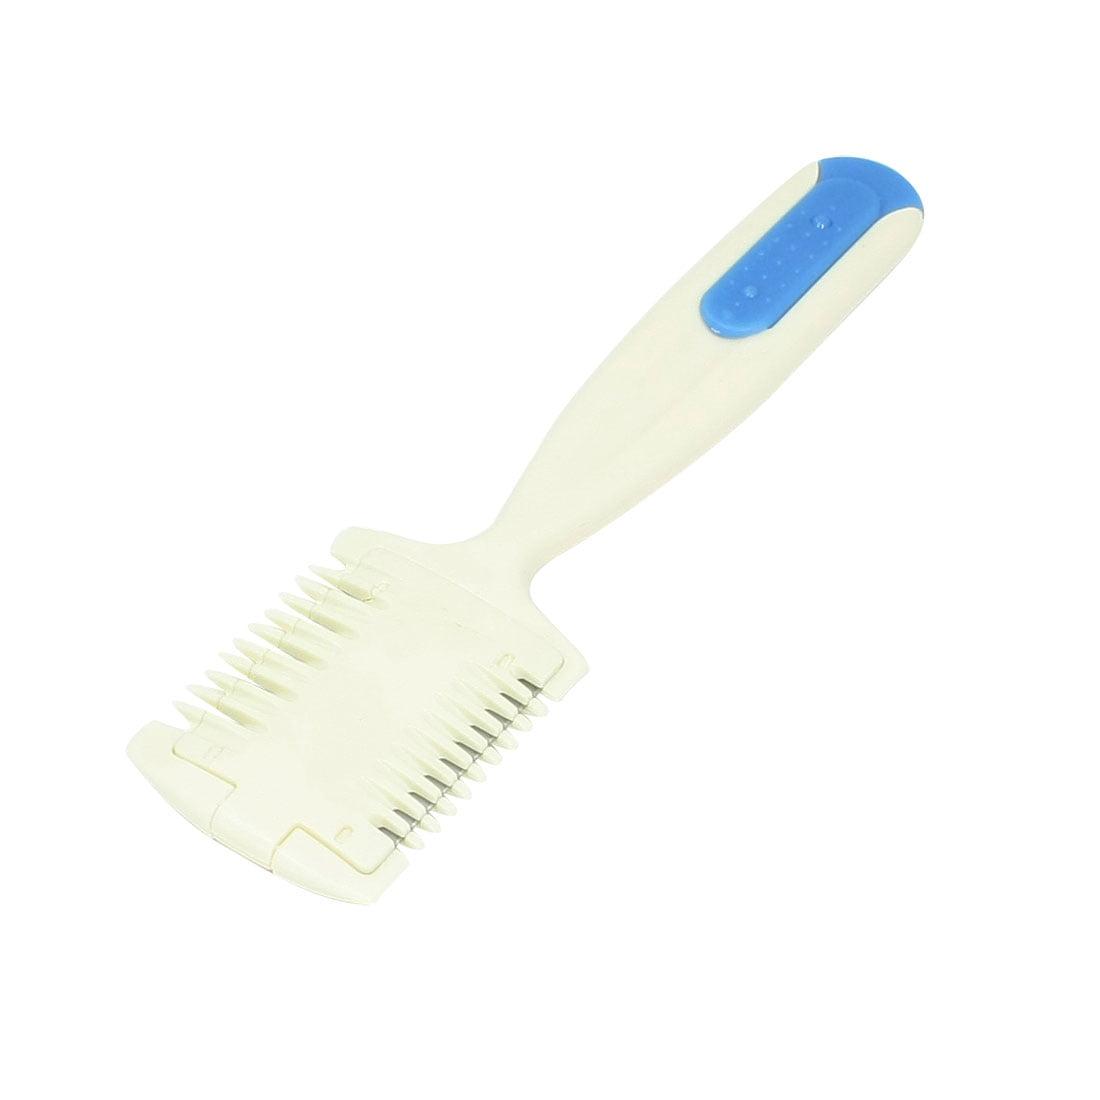 2 blades hair cutting thinning comb razor bangs trimmer beige